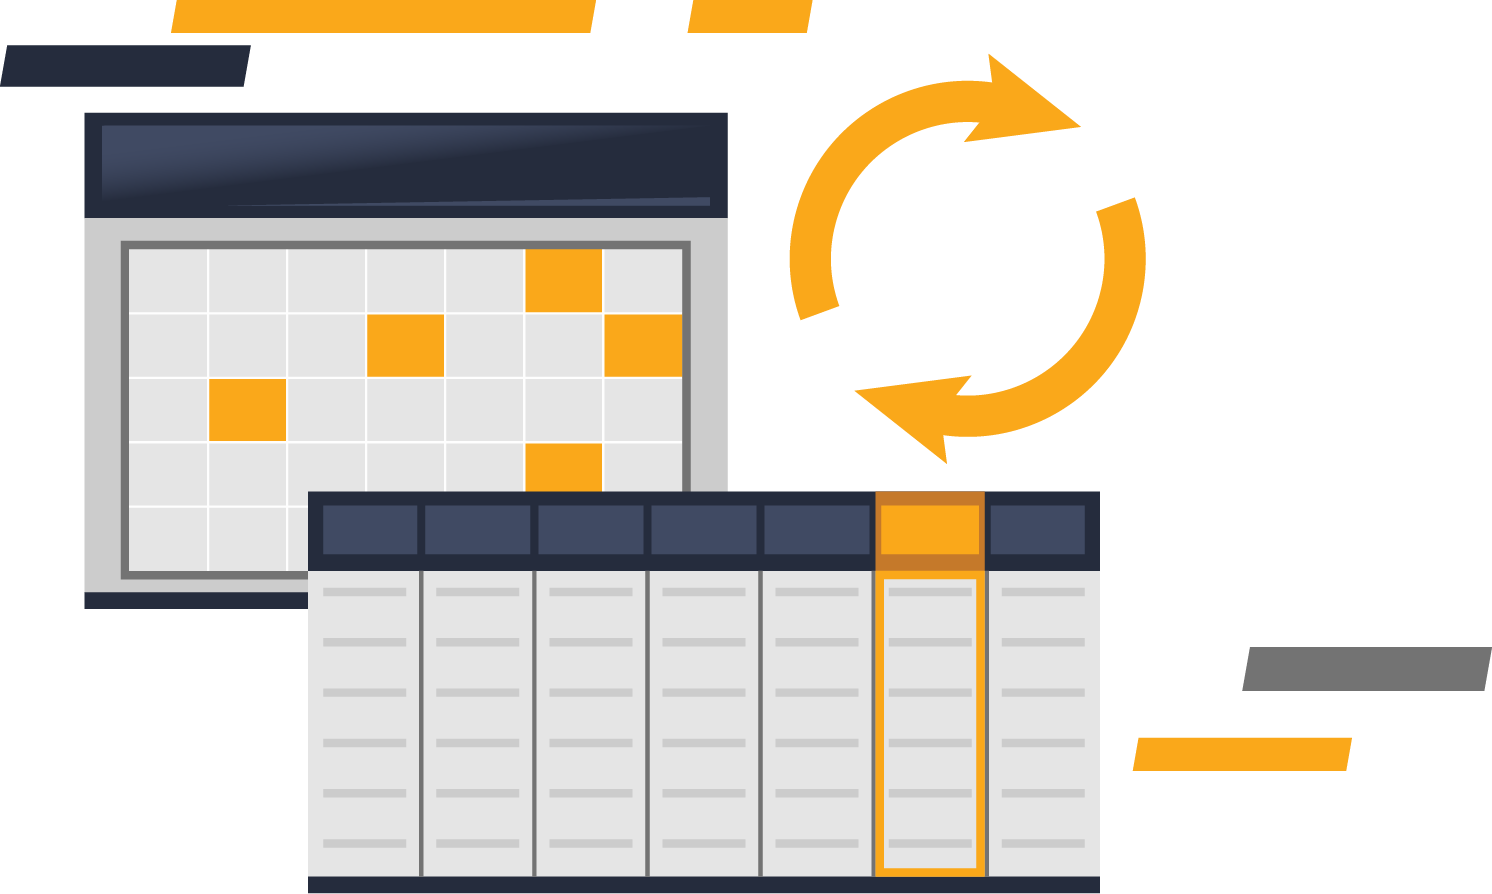 Purchase Data Metrics, data refresh frequency, spot illustration